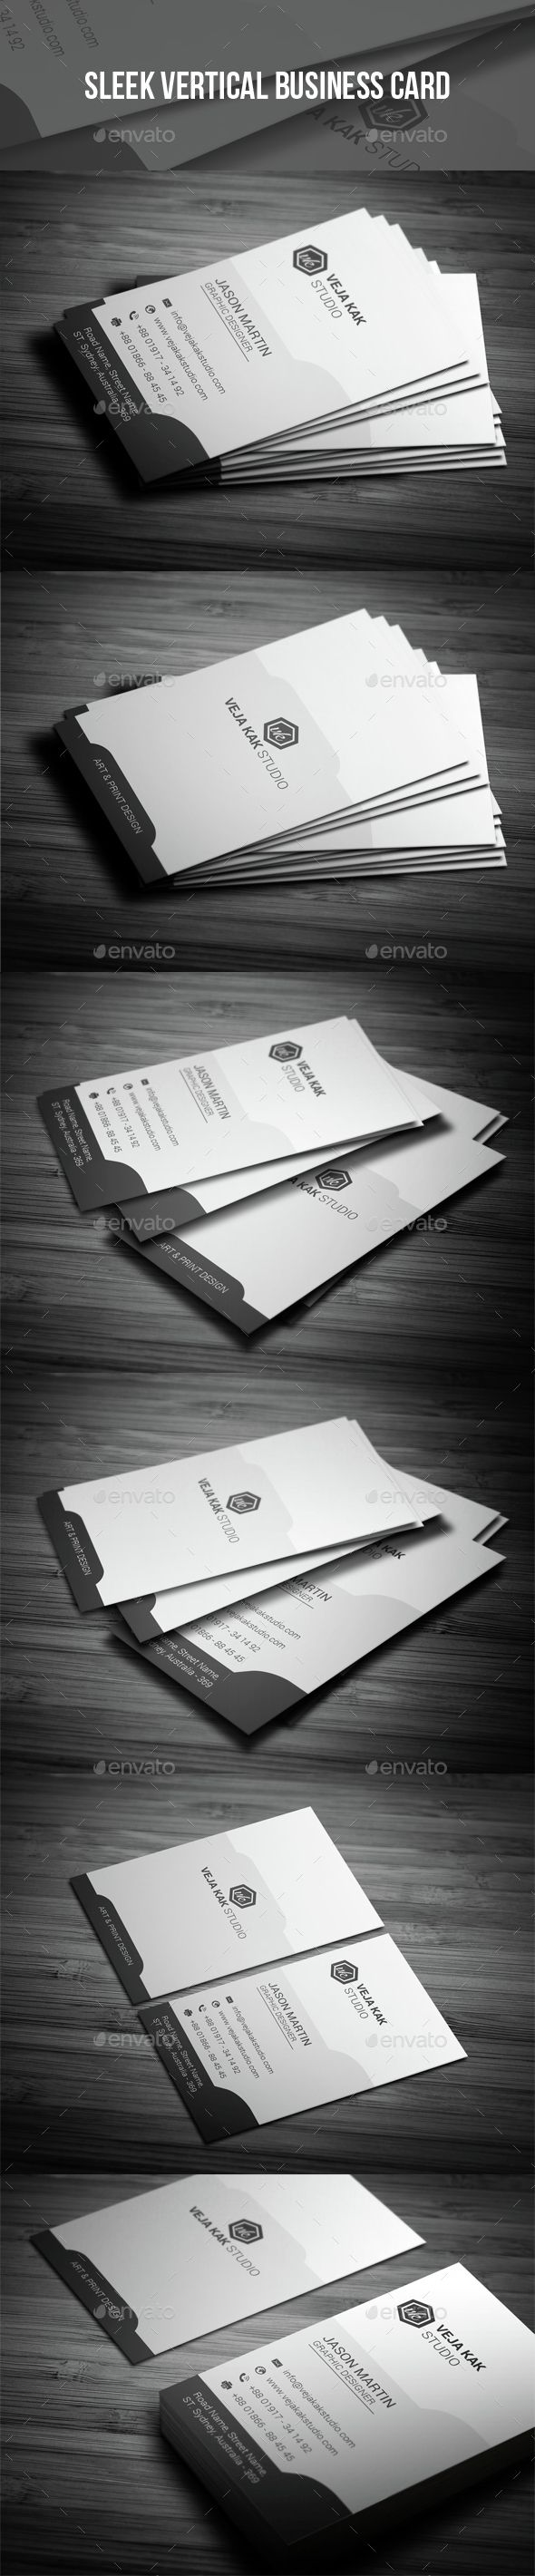 Sleek Vertical Business Card Template PSD. Download here: http://graphicriver.net/item/sleek-vertical-business-card/14954756?ref=ksioks